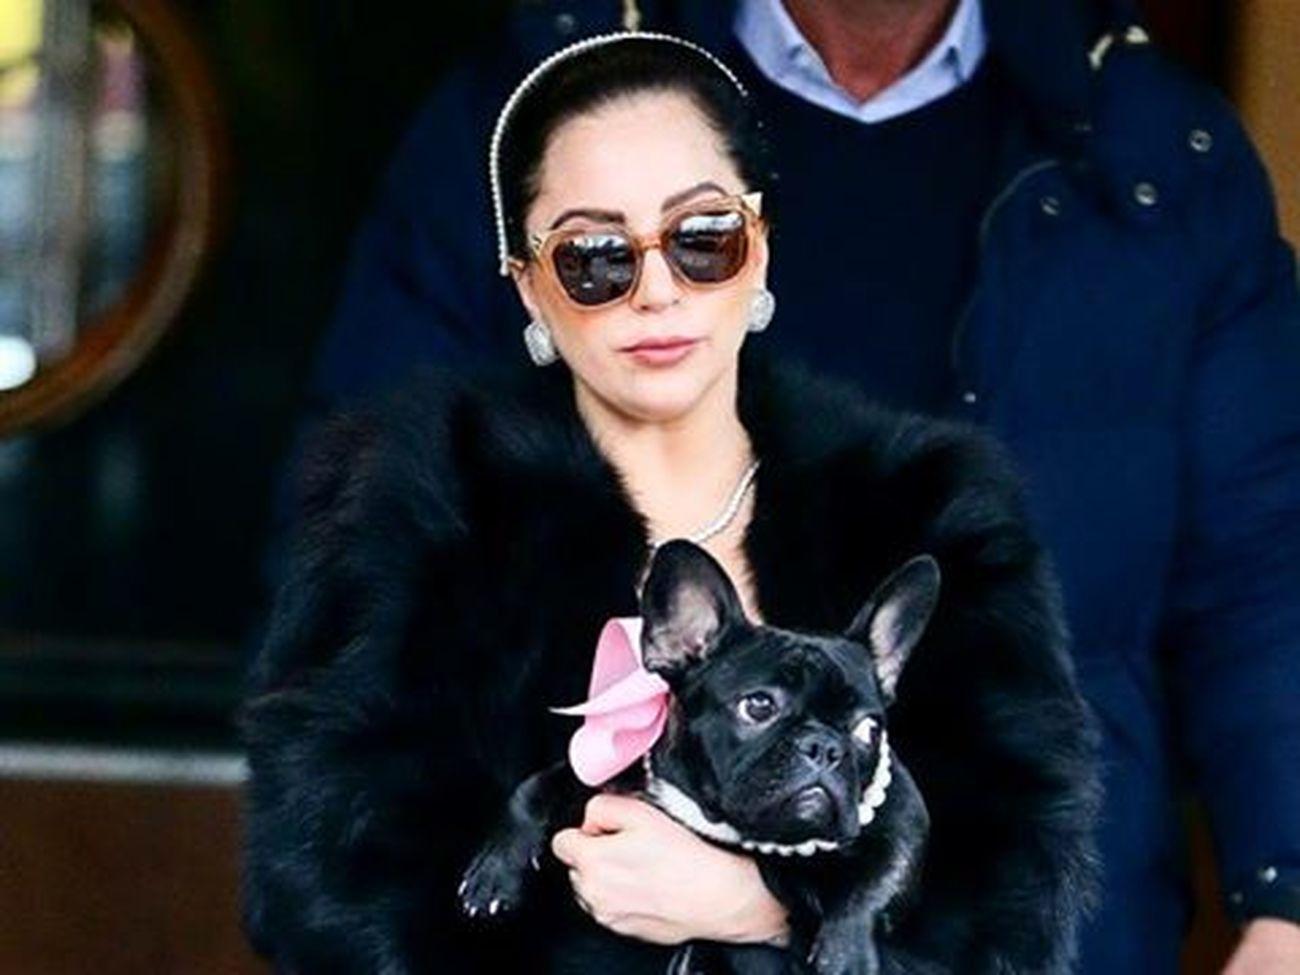 I love Lady Gaga she is my QUEEN @ladygaga @ladygaga_03 @gagzz_monster Gaga Gagzz_monster LG5 Ladygaga Ladygaga_03